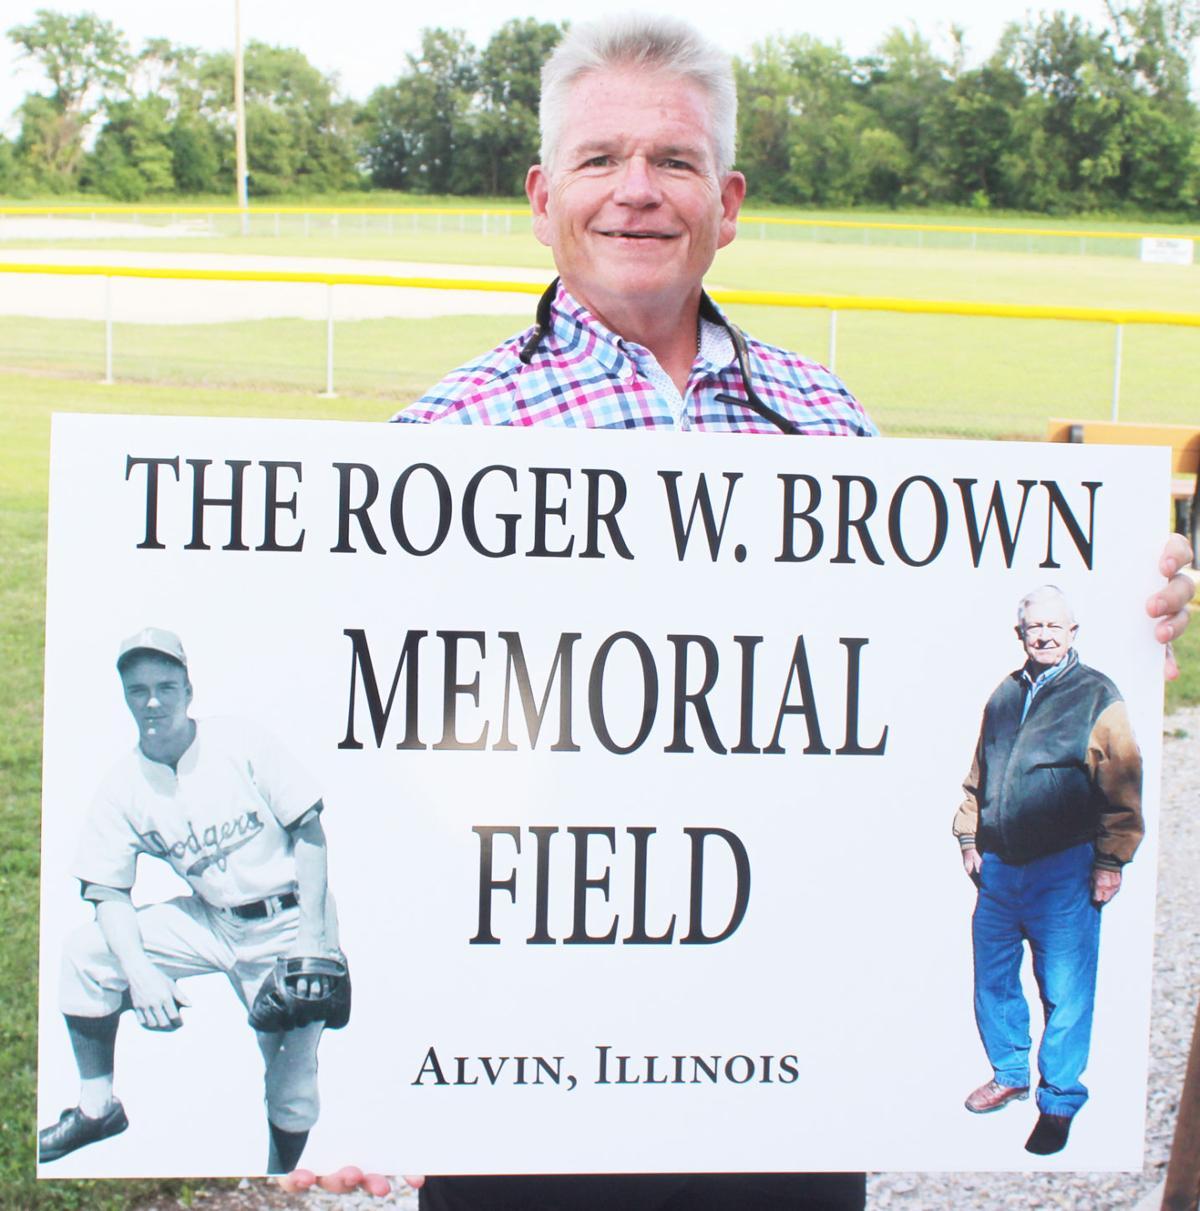 Alvin Field Pic 1.jpg